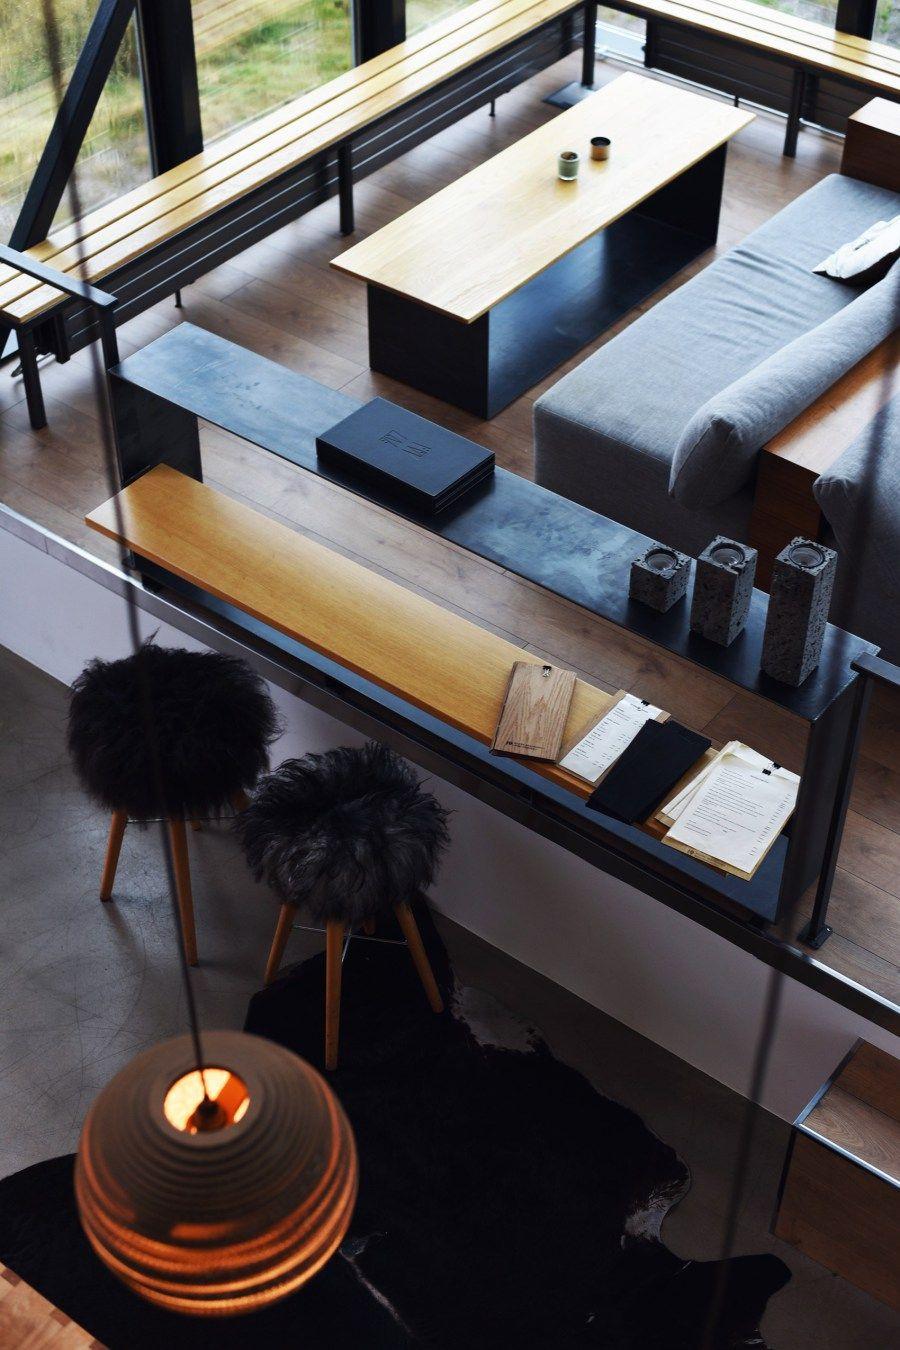 iceland-Ion-Luxury-Adventure-Hotel-interior-fashiioncarpet